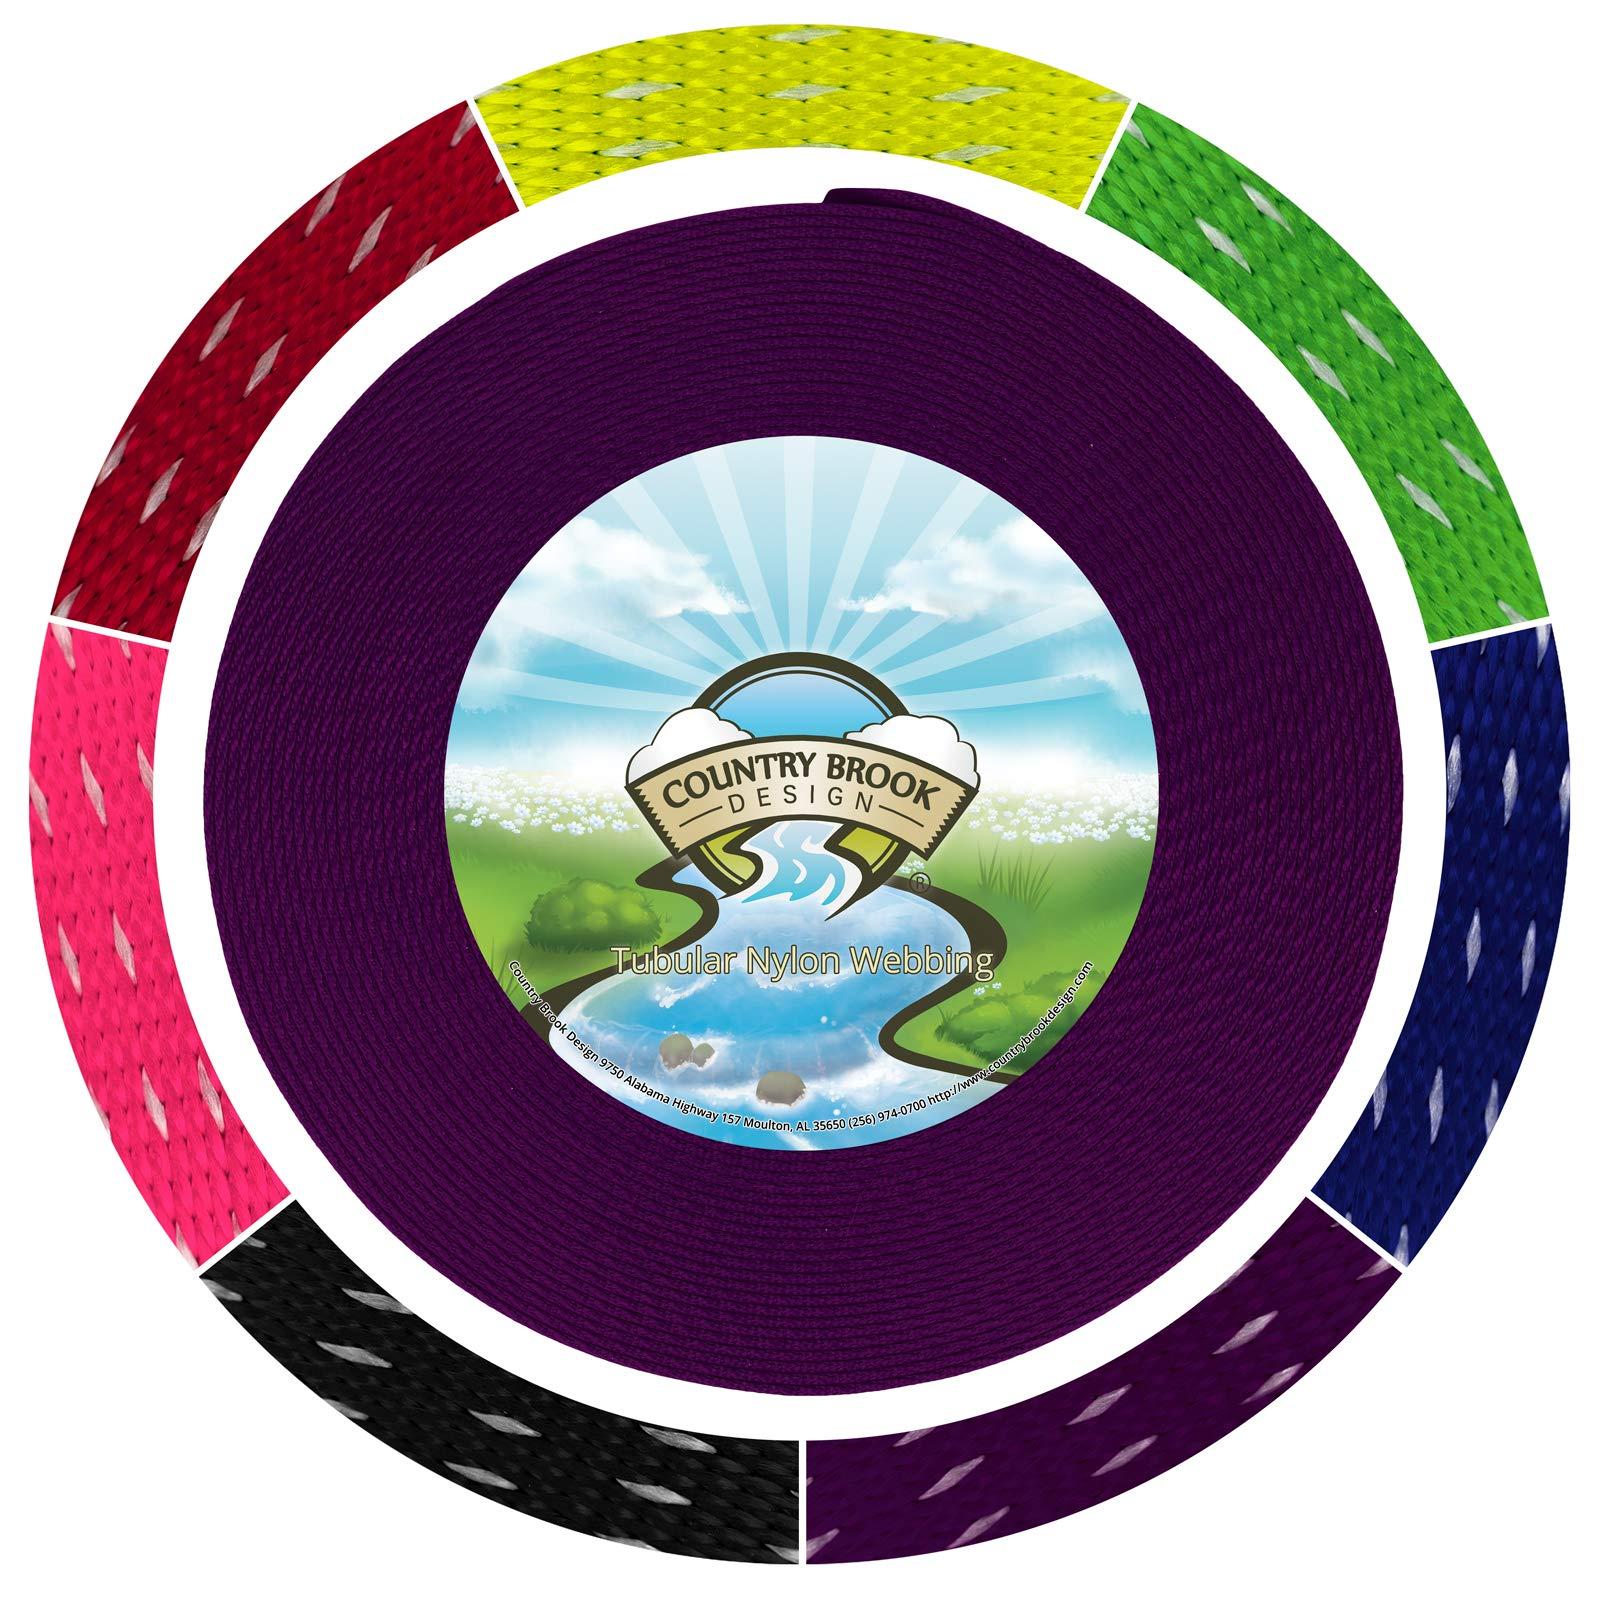 Country Brook Design 1 Inch Purple Climbing Spec Tubular Nylon Webbing, 10 Yards